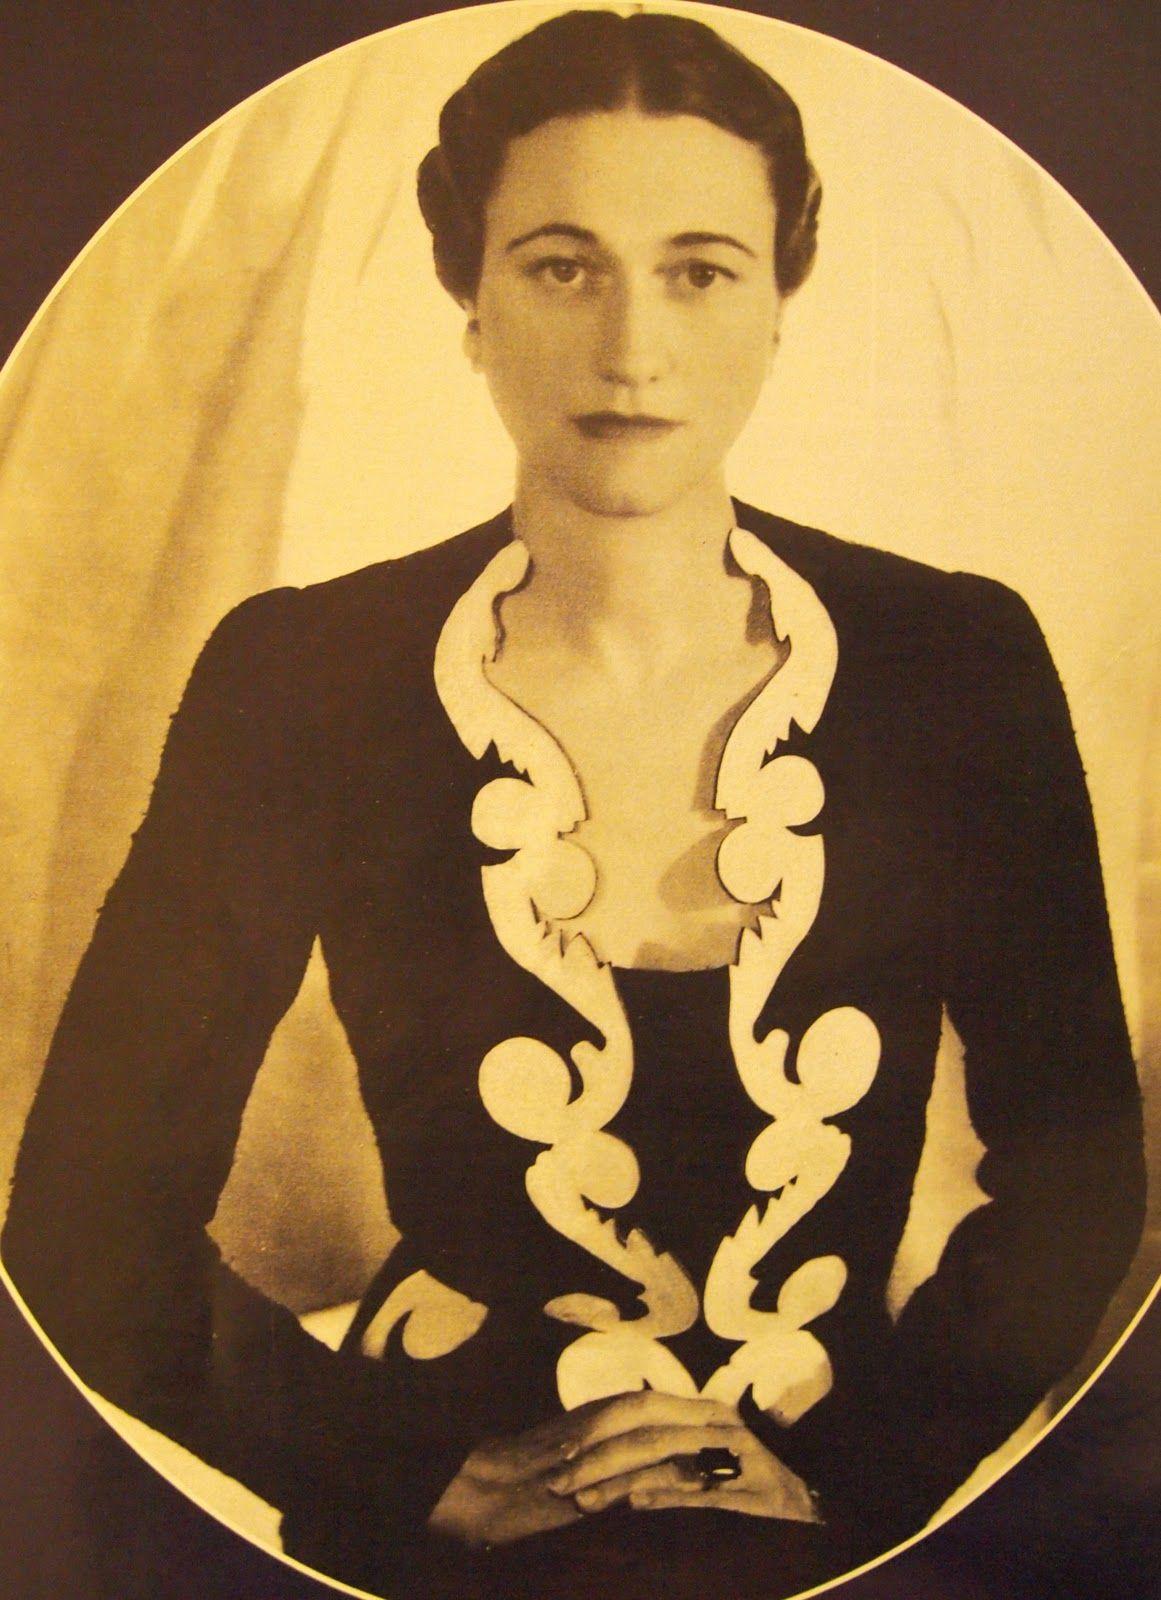 Wallis simpson wedding dress  Wallis Simpson  a woman of seduction scandal I like the outfit